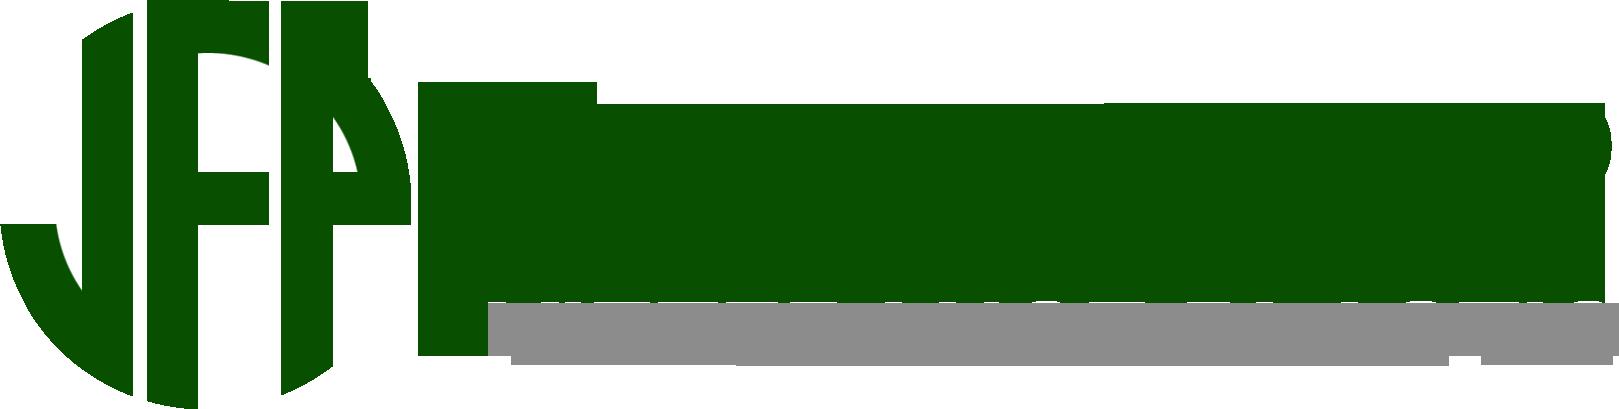 logo nhua viet phap png 2017